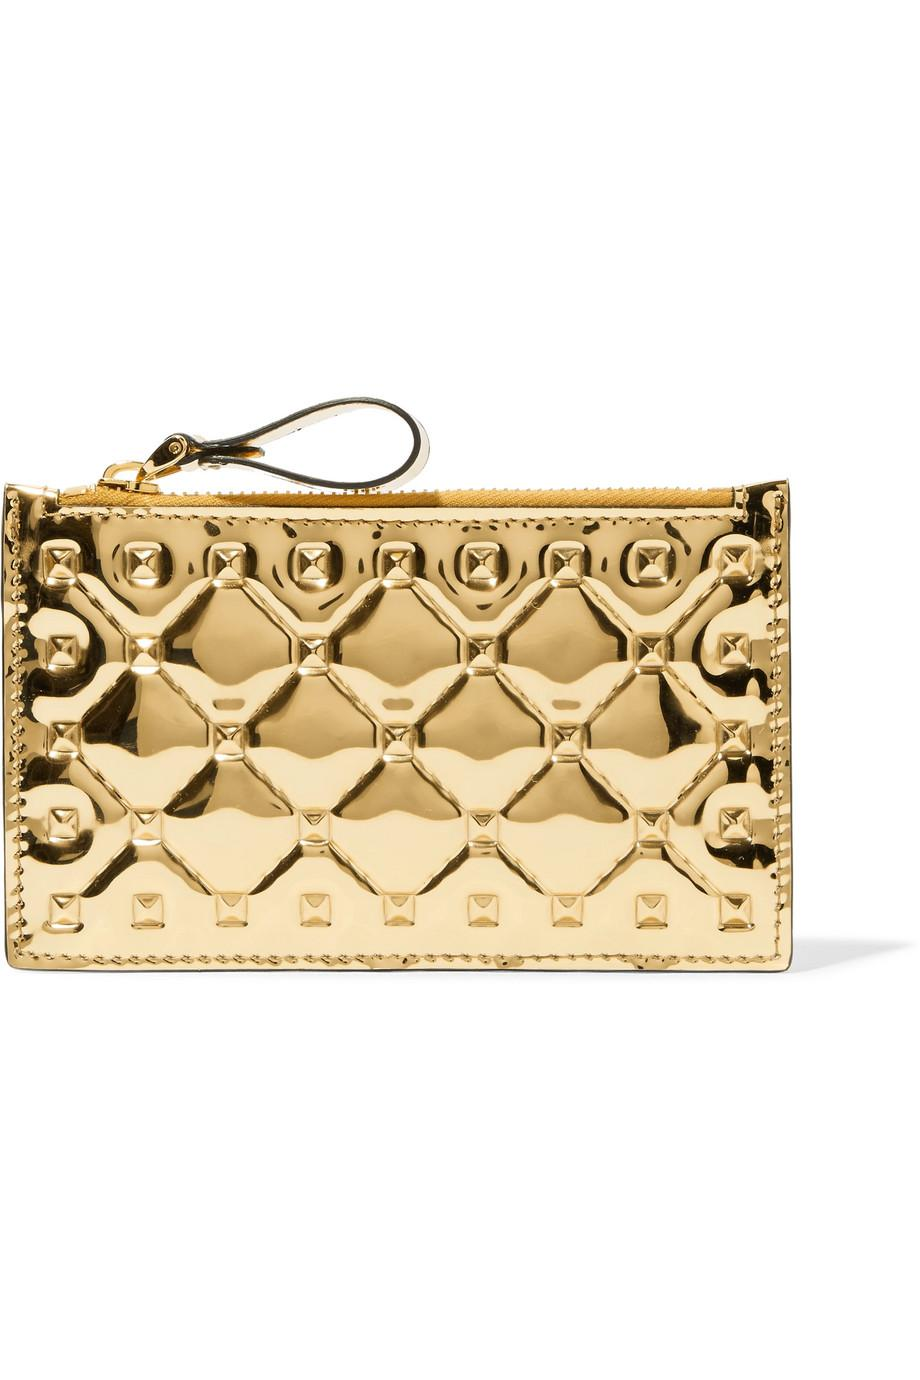 Valentino Garavani The Rockstud Spike Embossed Mirrored-leather Wallet - Gold Valentino dwYRO4